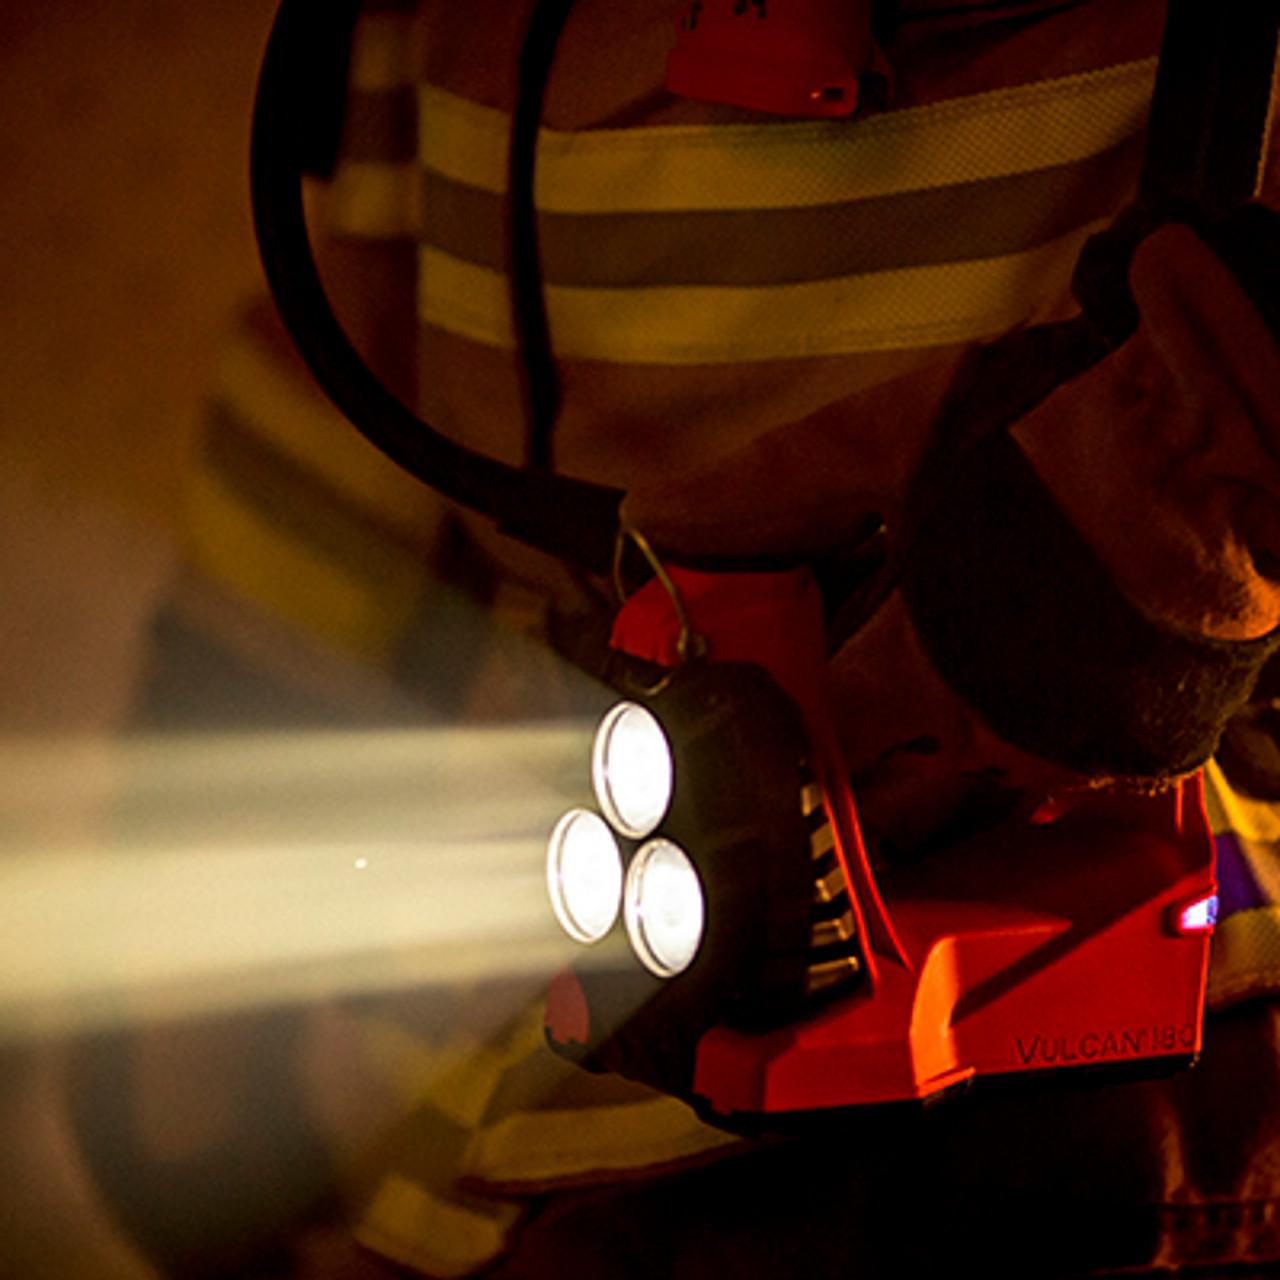 streamlight vulcan 180 led lantern